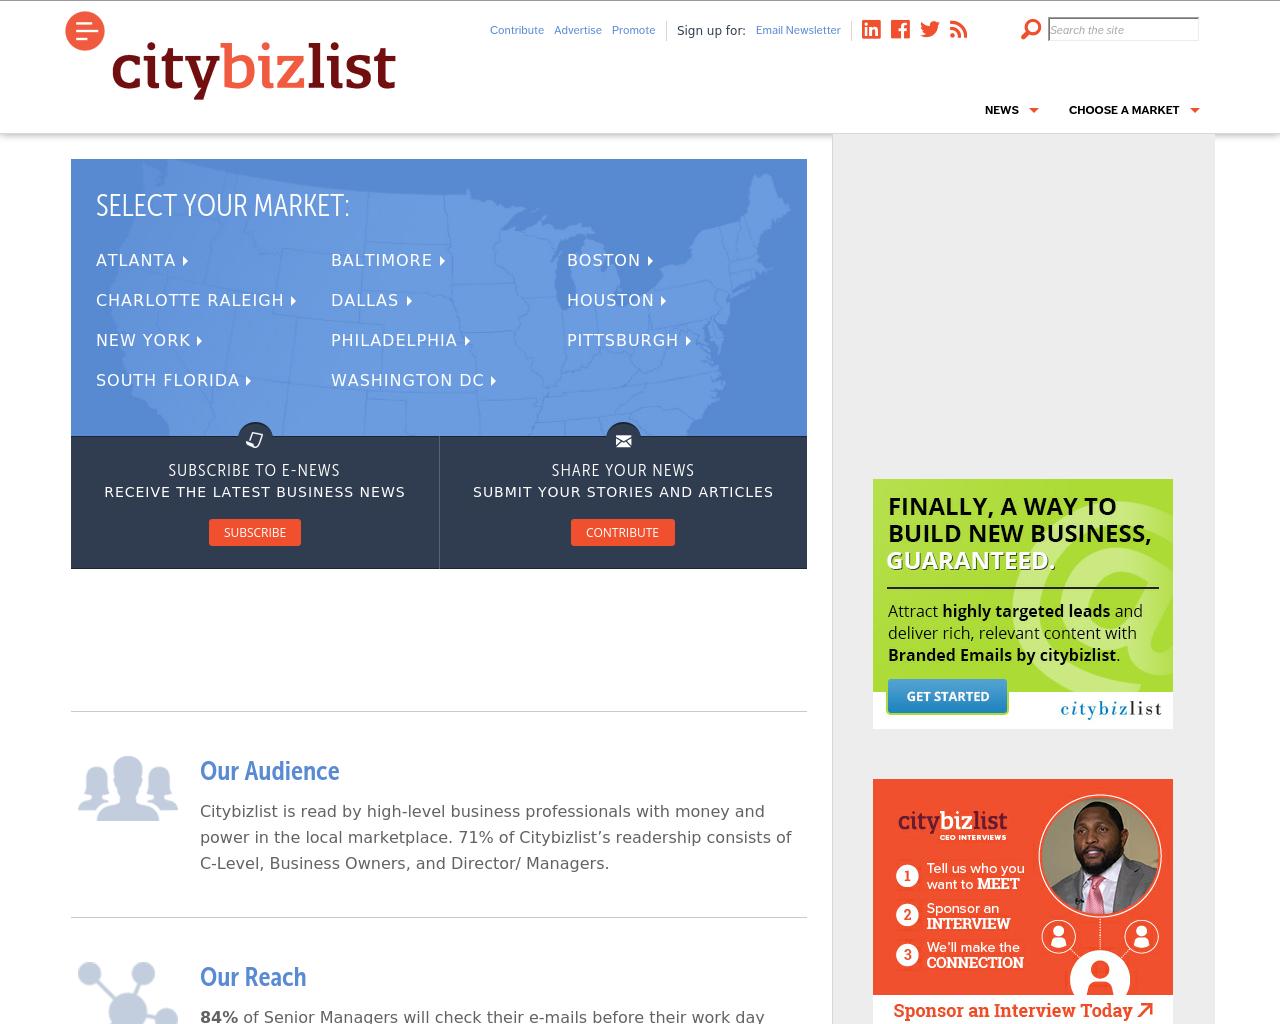 citybizlist-Advertising-Reviews-Pricing